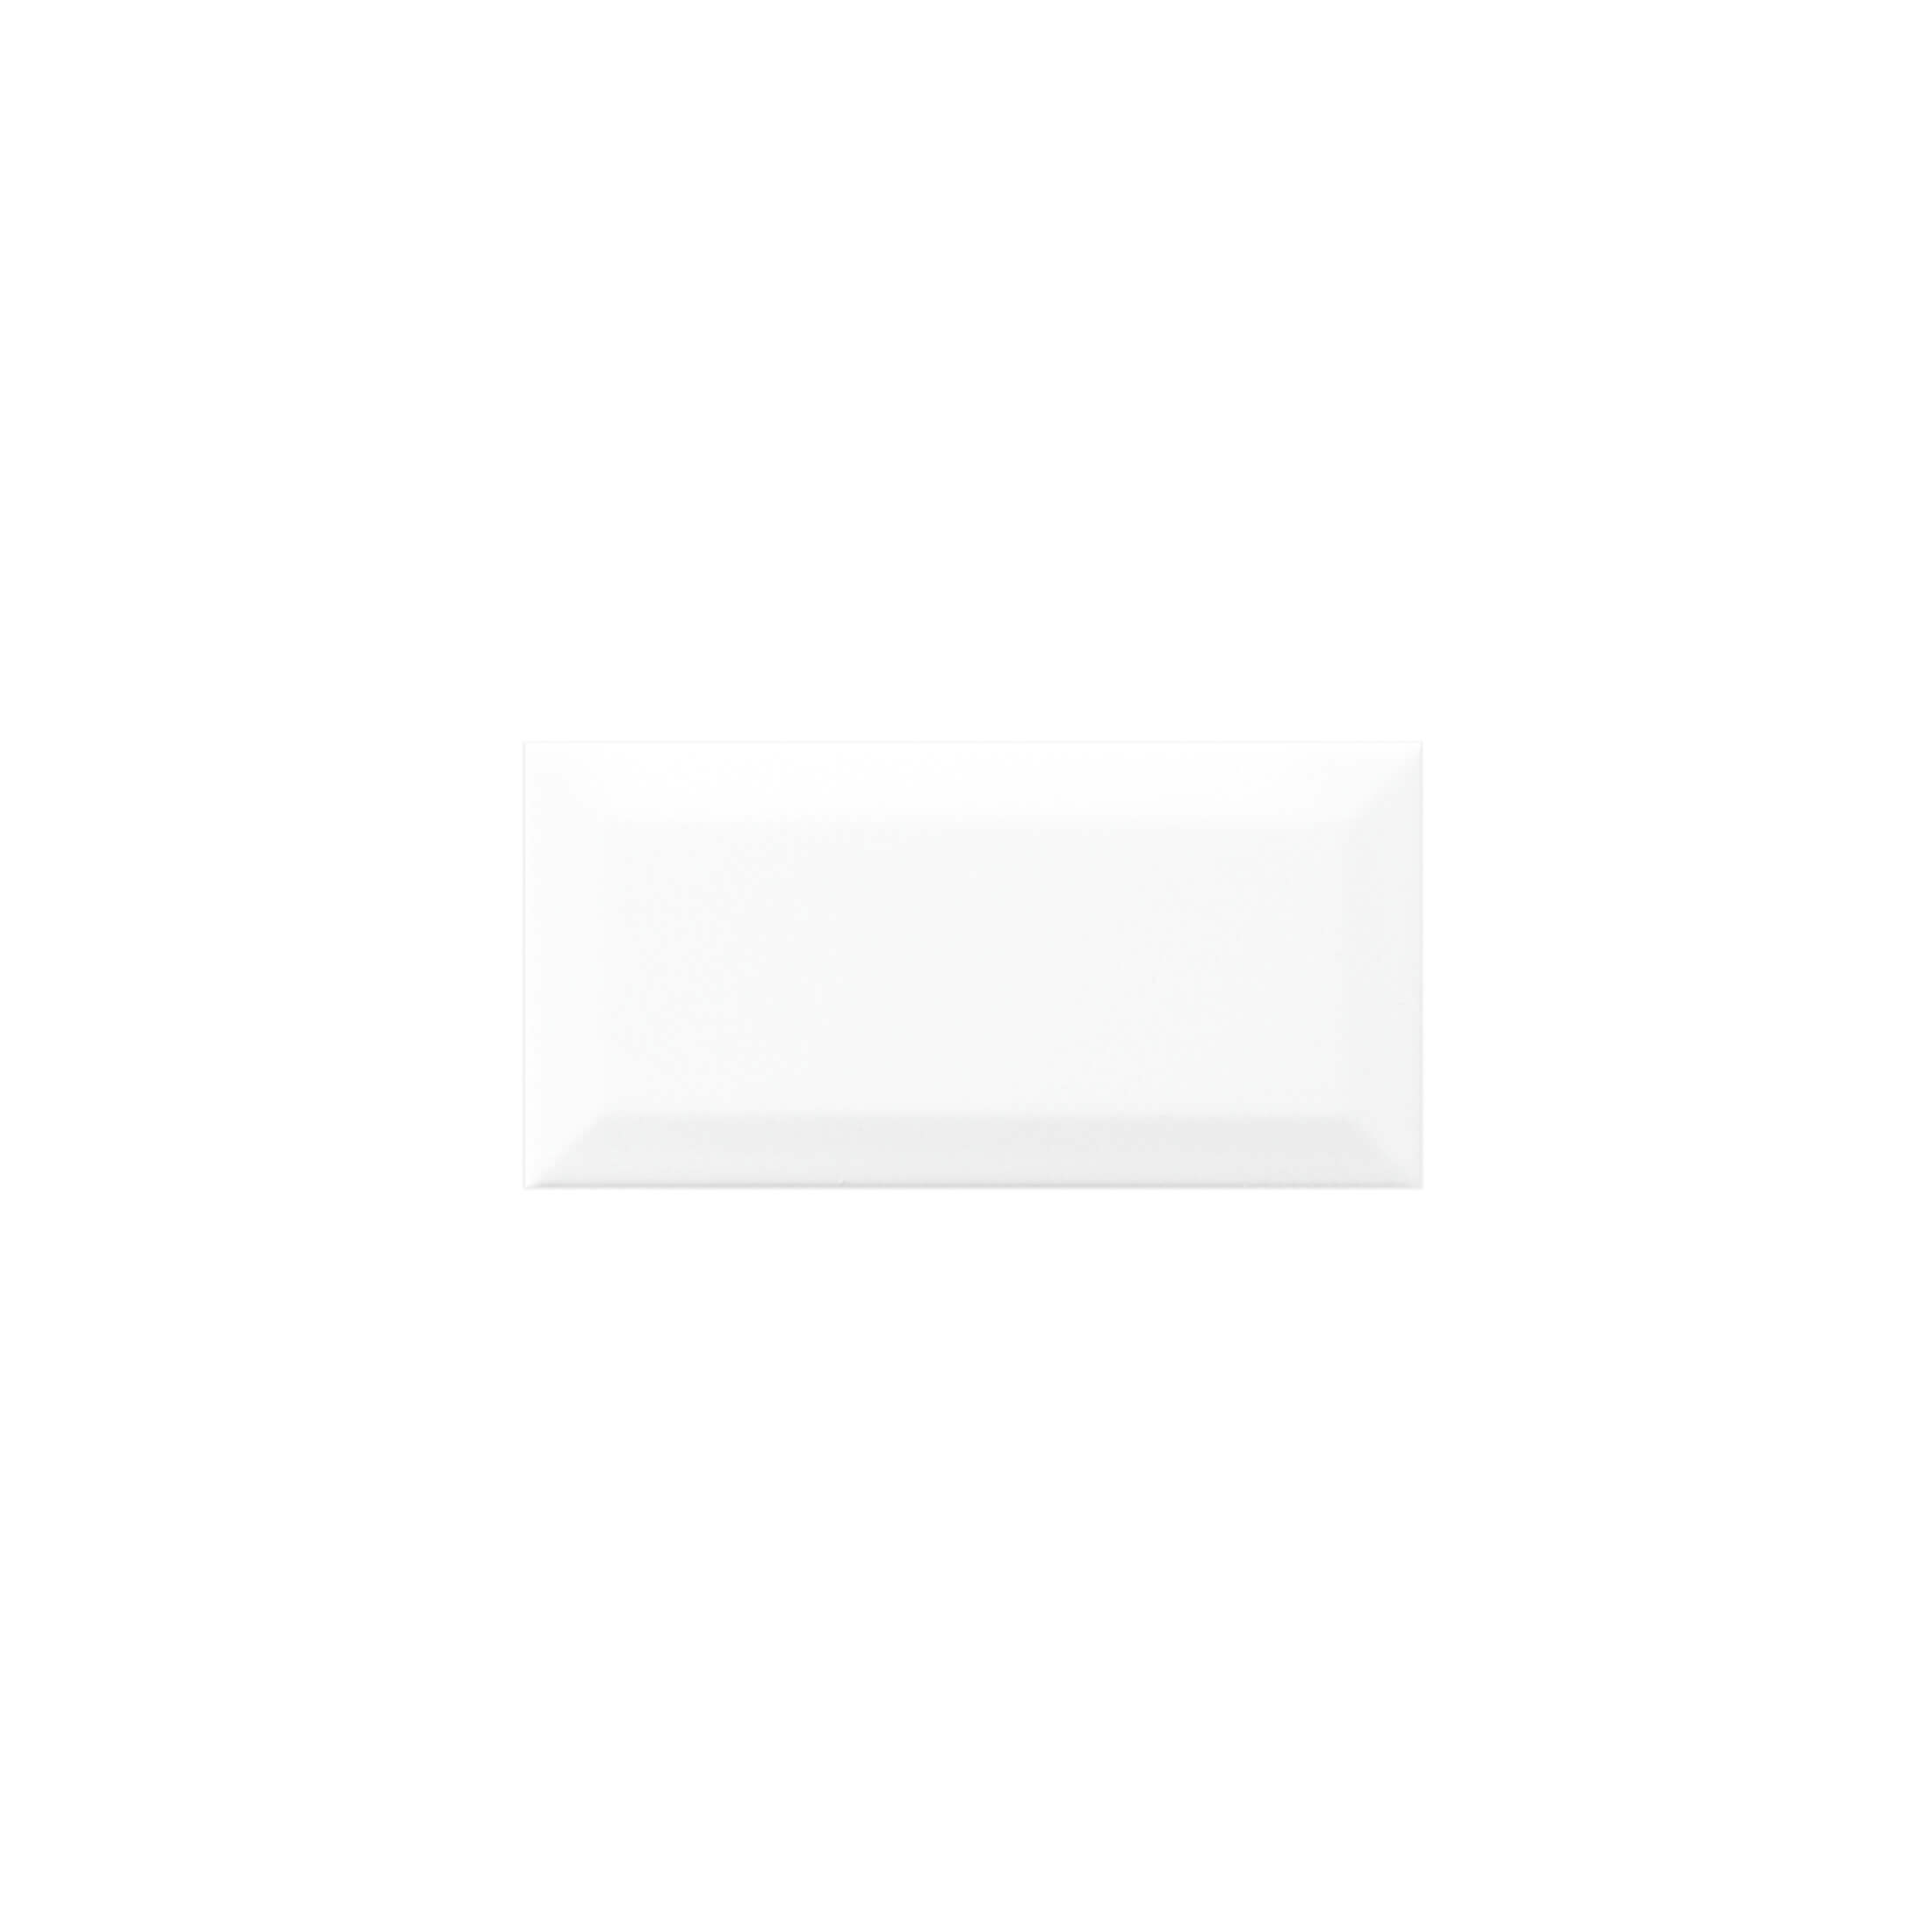 ADNE2019 - BISELADO PB - 7.5 cm X 15 cm